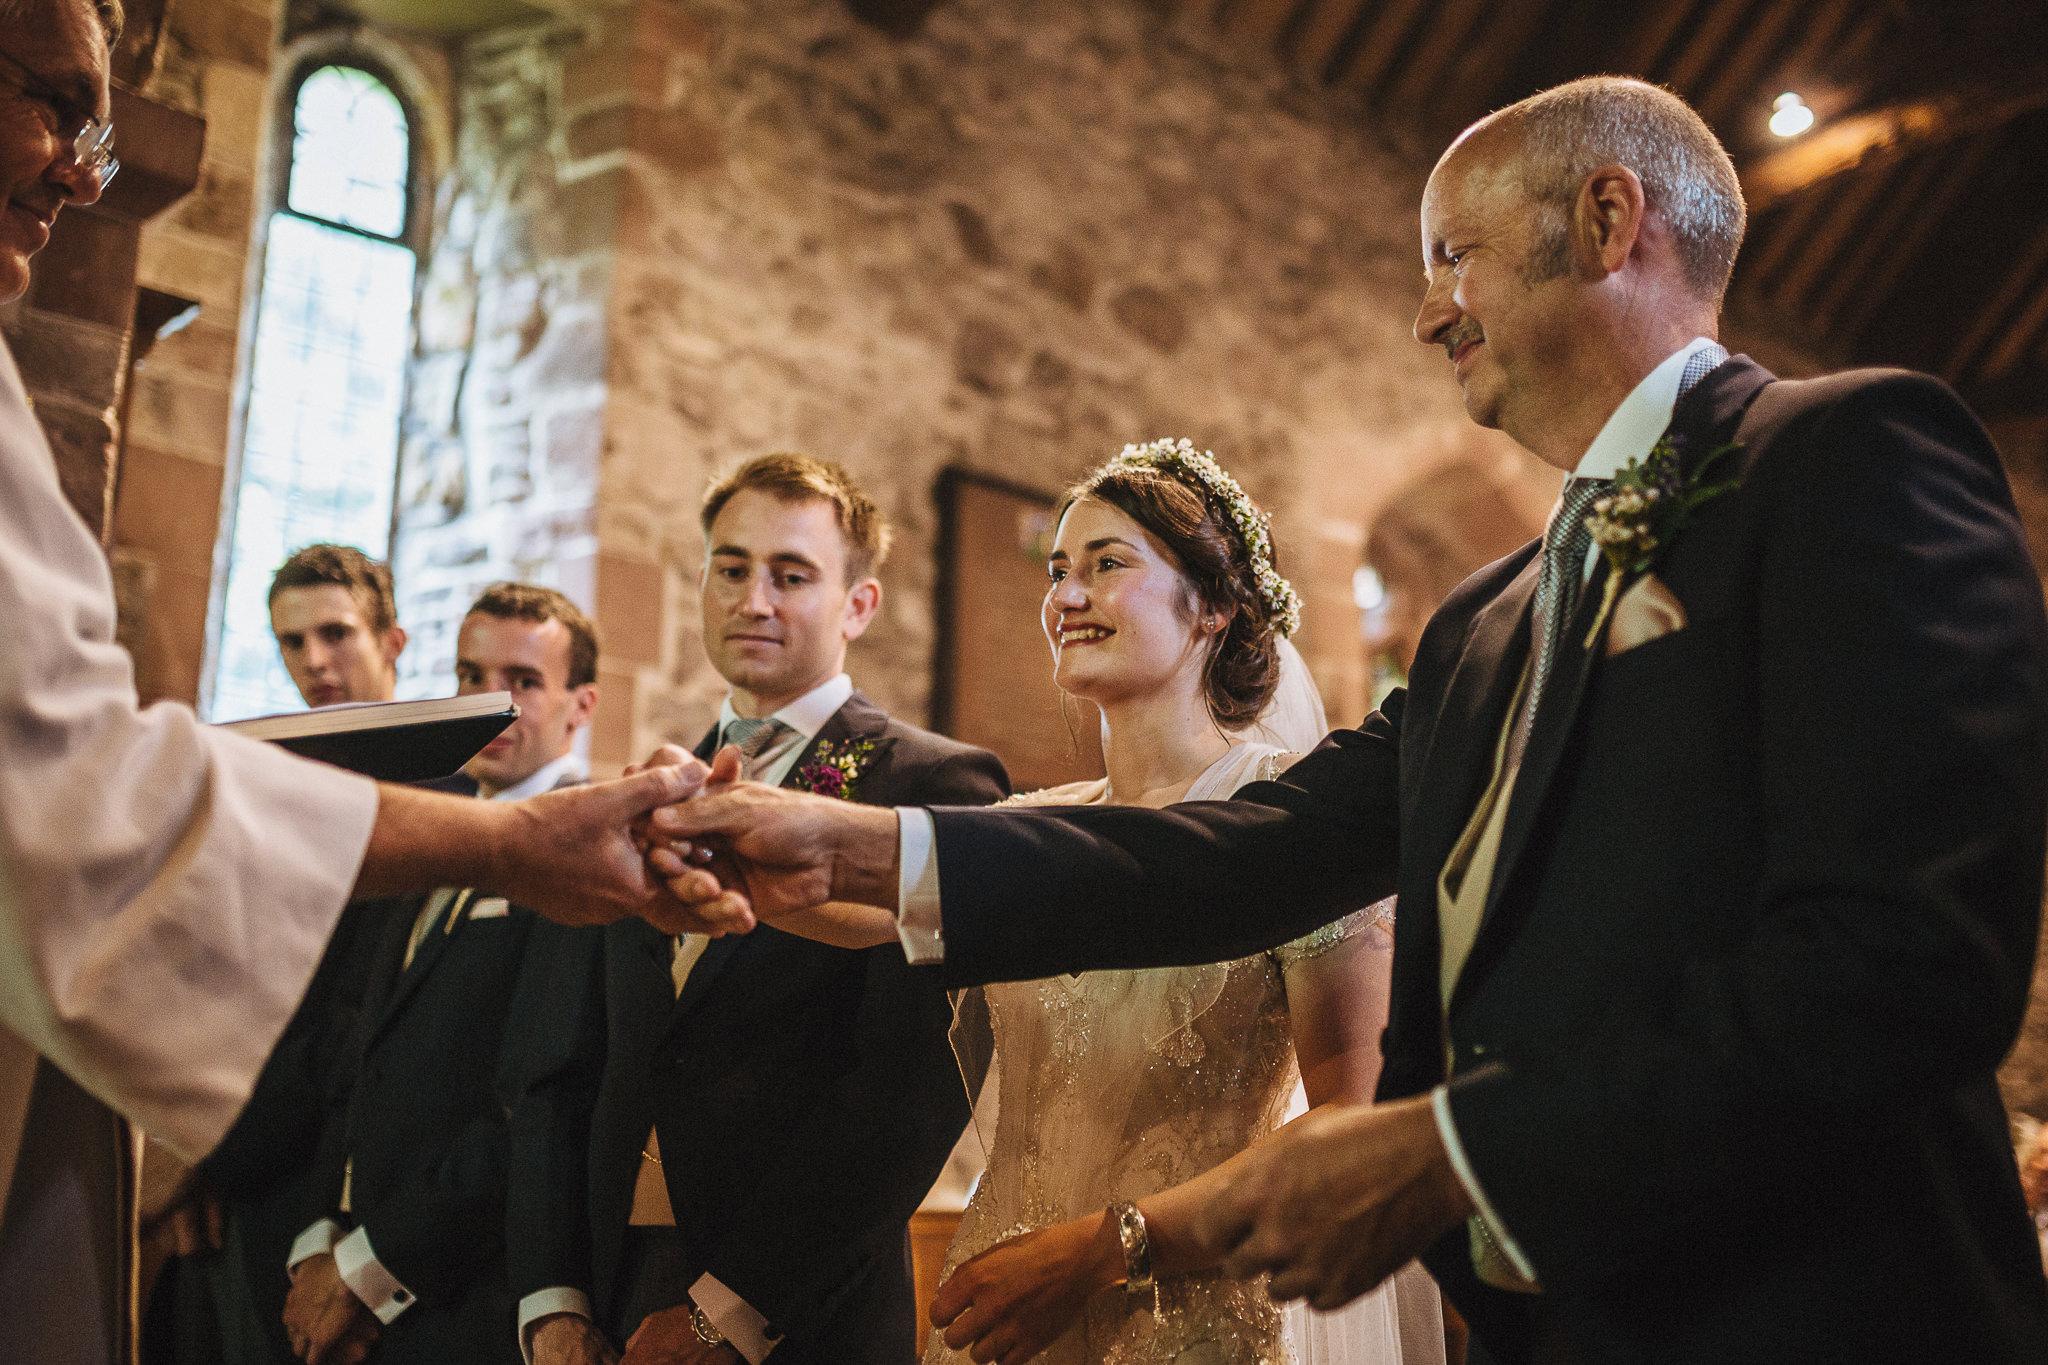 paul-marbrook-Farm-Wedding-Photographer-Lancashire-90028